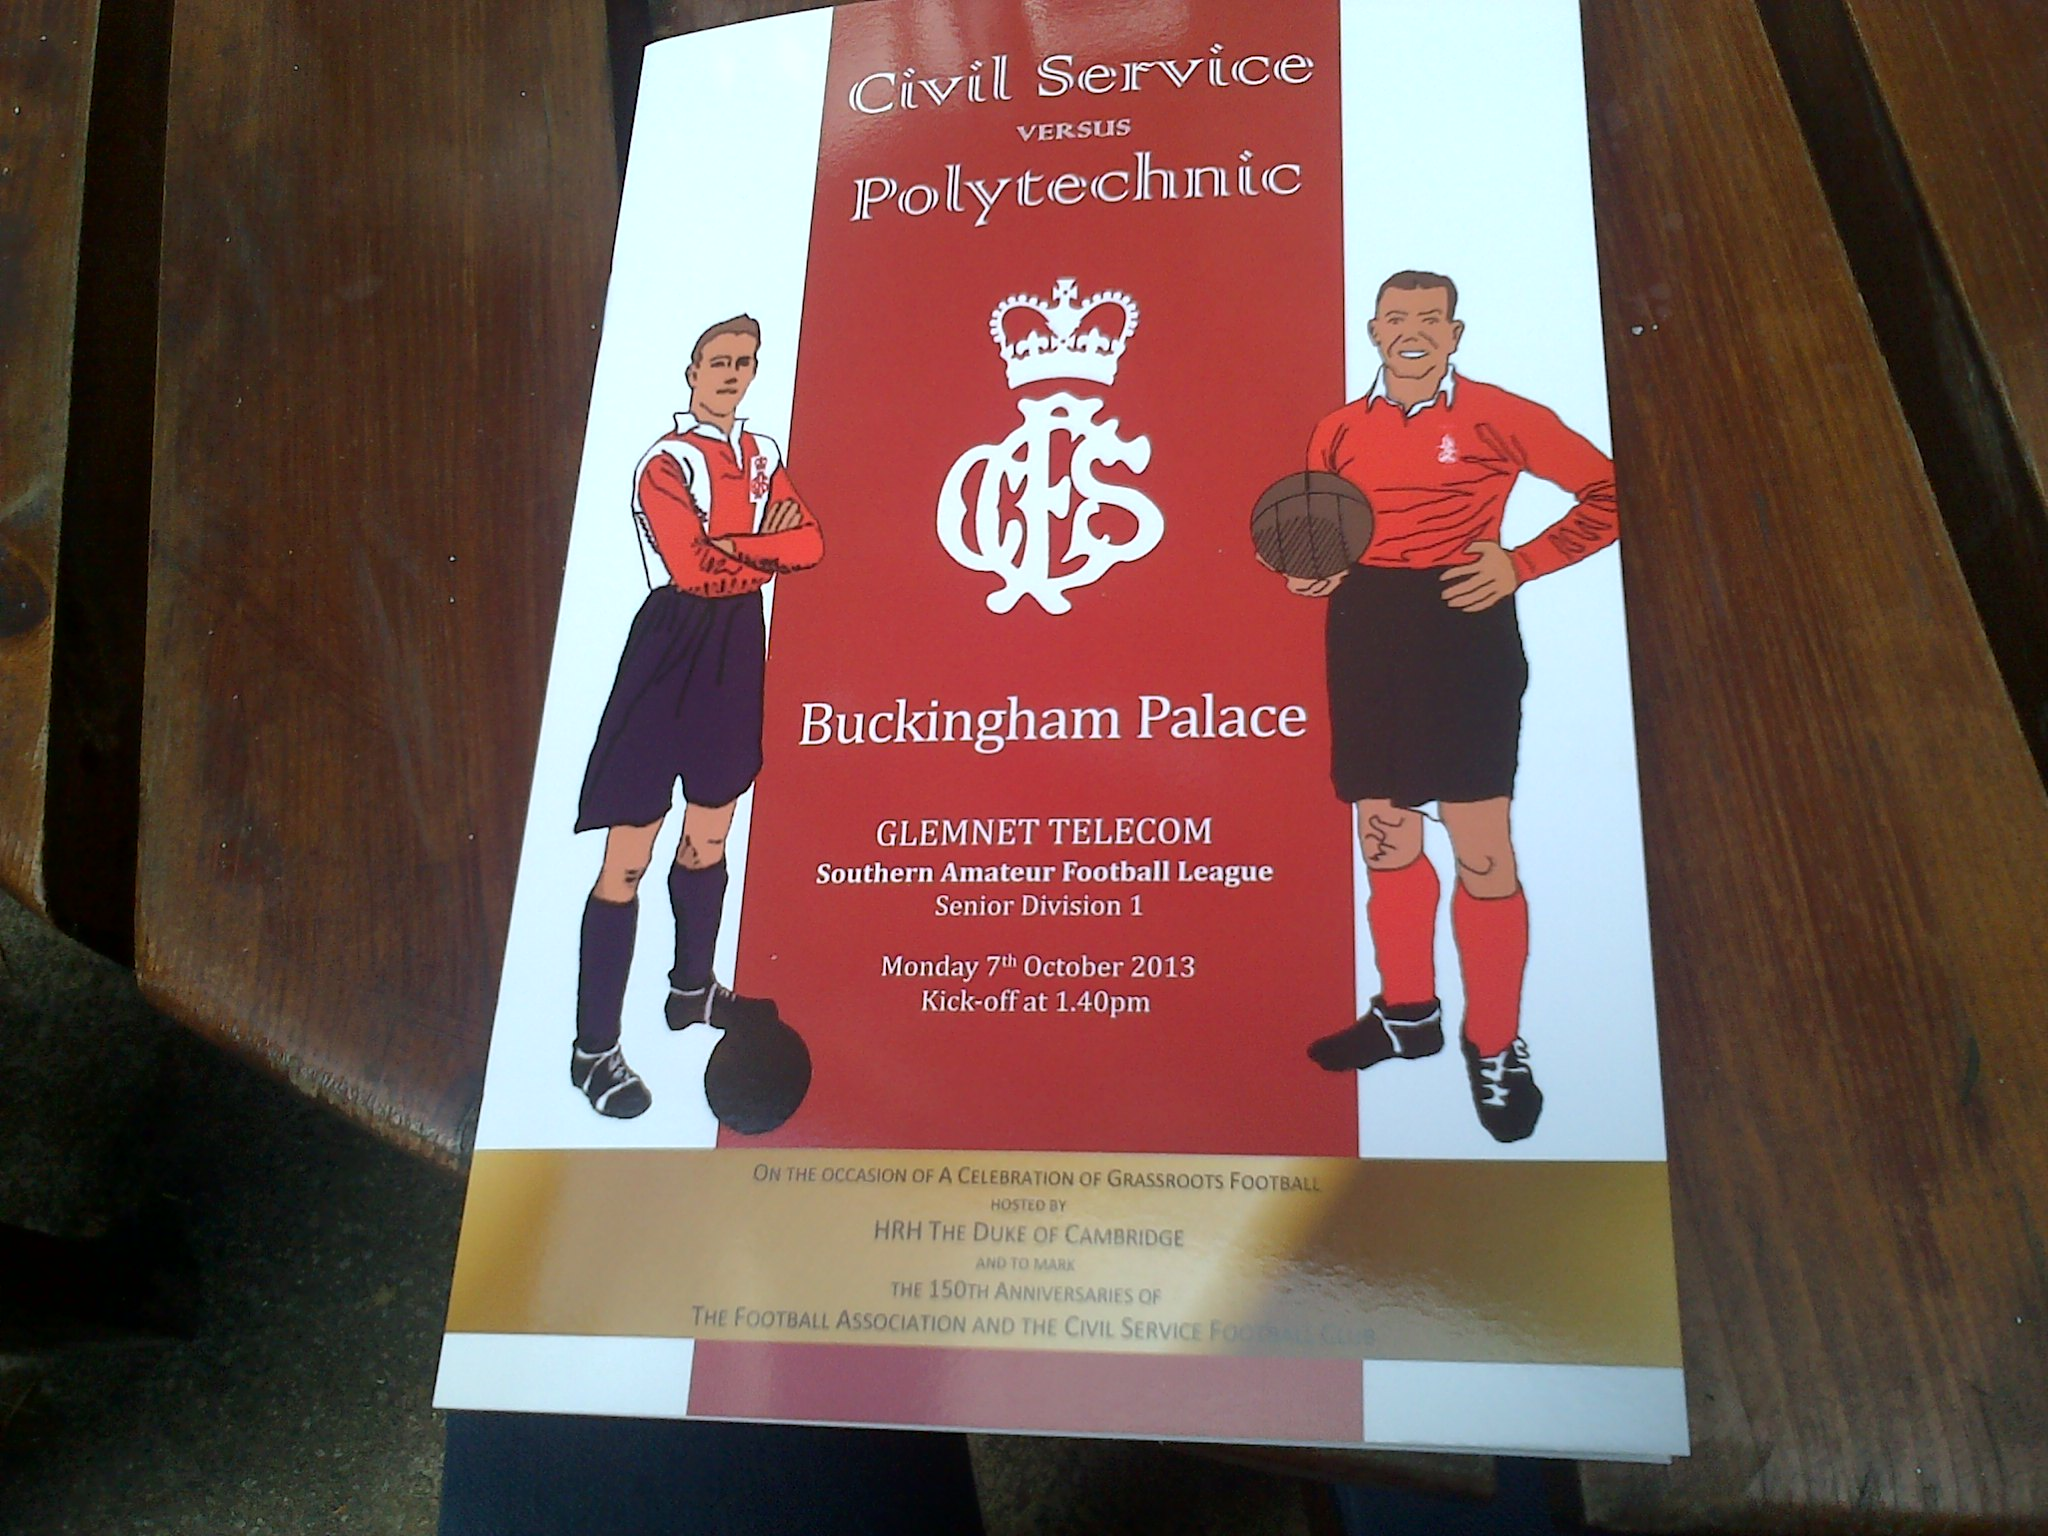 Match day programme - Fooball at Buckingham Palace